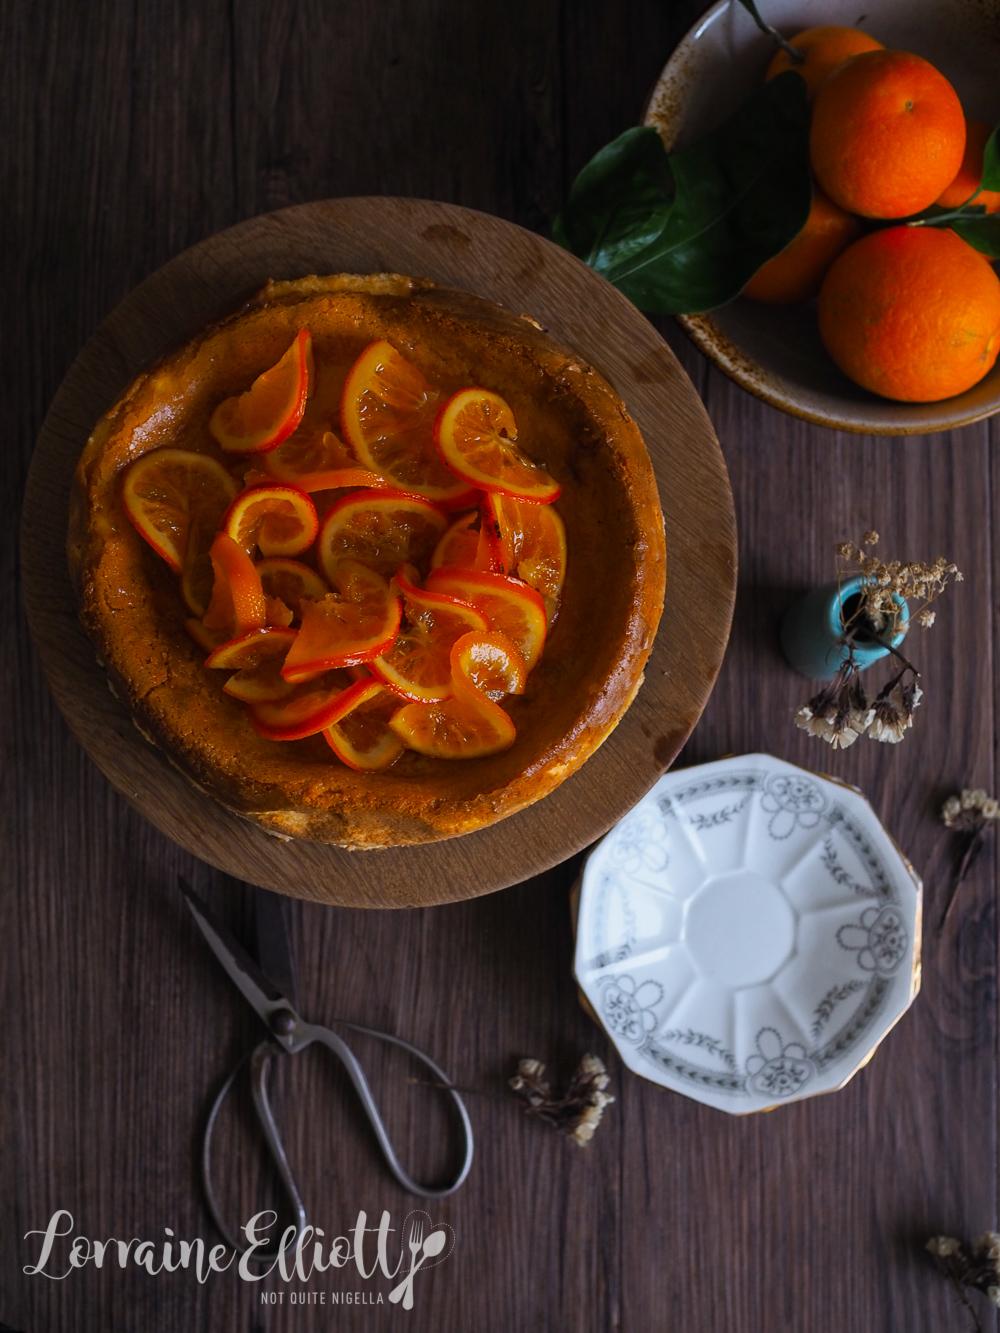 Tangelo Cheesecake recipe